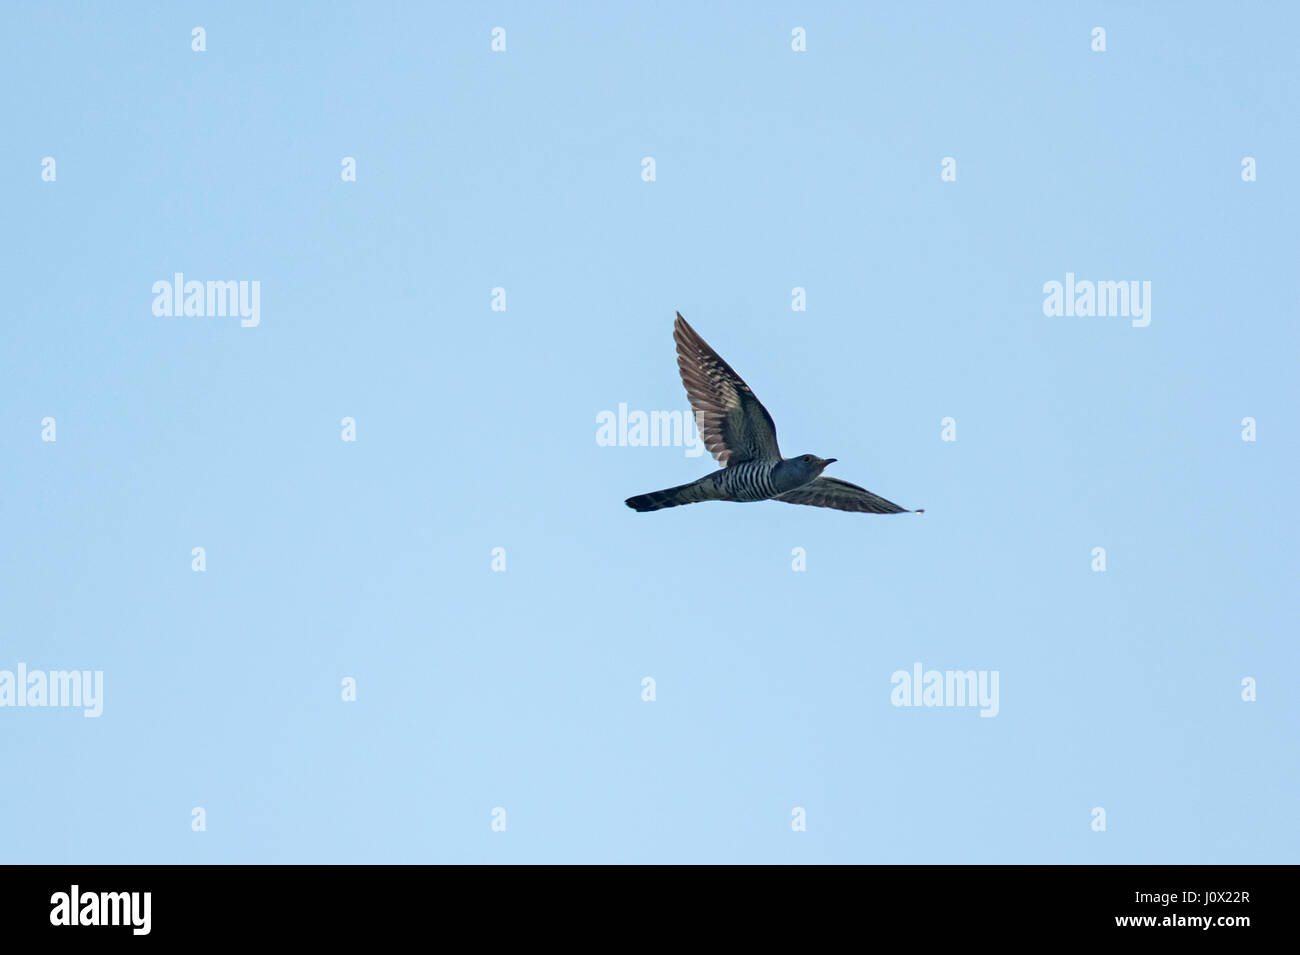 Indian Cuckoo (Cuculus micropterus concretus) in flight, Tmatboey, Cambodia - Stock Image